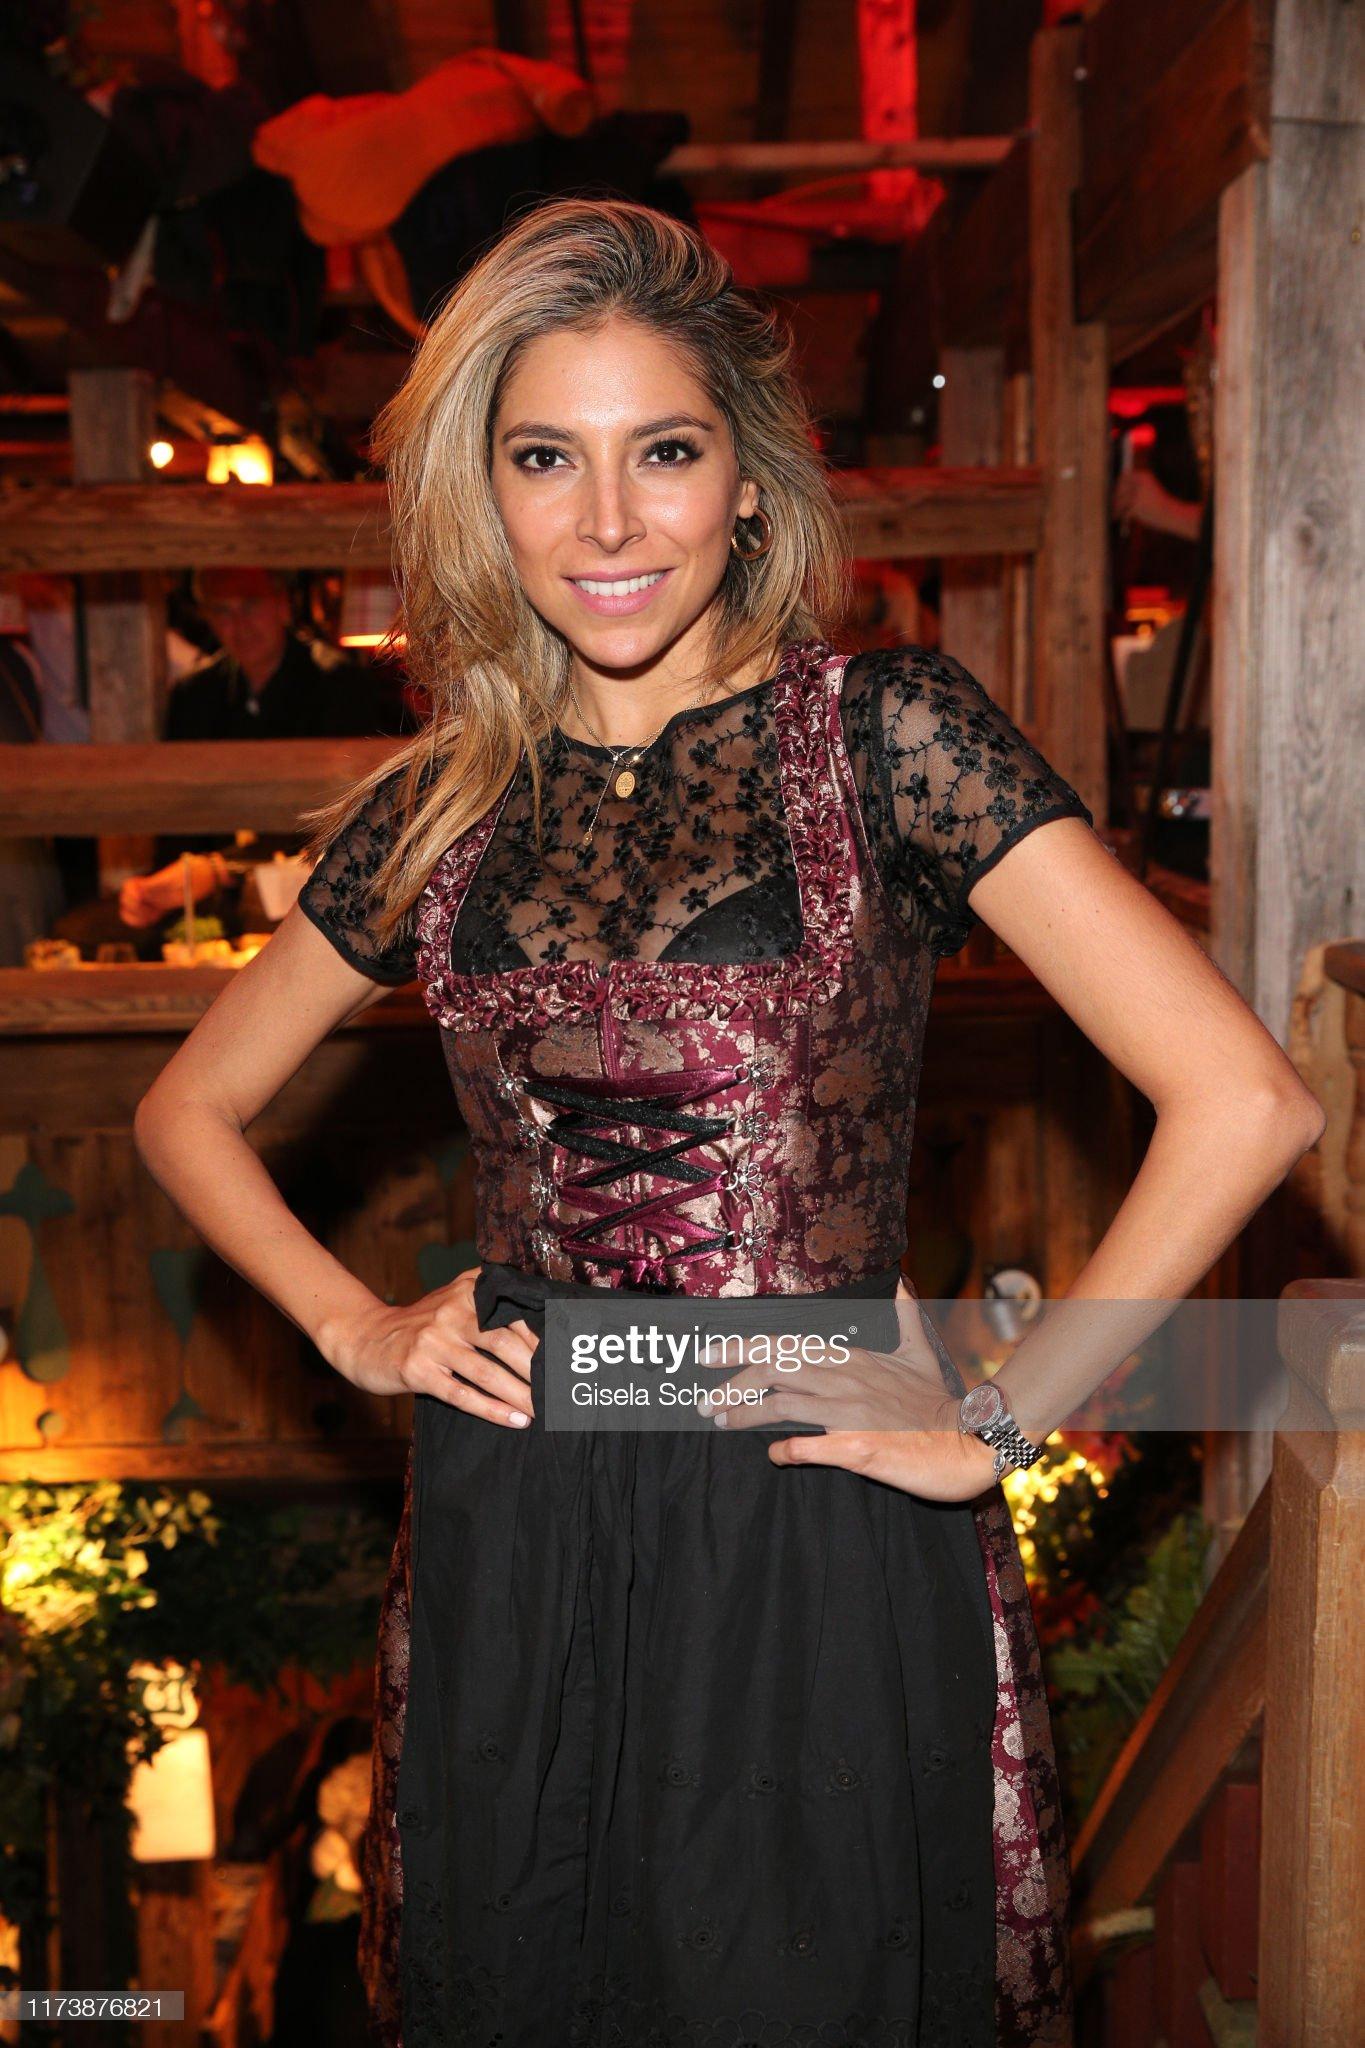 ¿Cuánto mide Eva Marcela Rodríguez? - Altura Sports-moderator-eva-marcela-rodriguez-during-the-oktoberfest-2019-at-picture-id1173876821?s=2048x2048